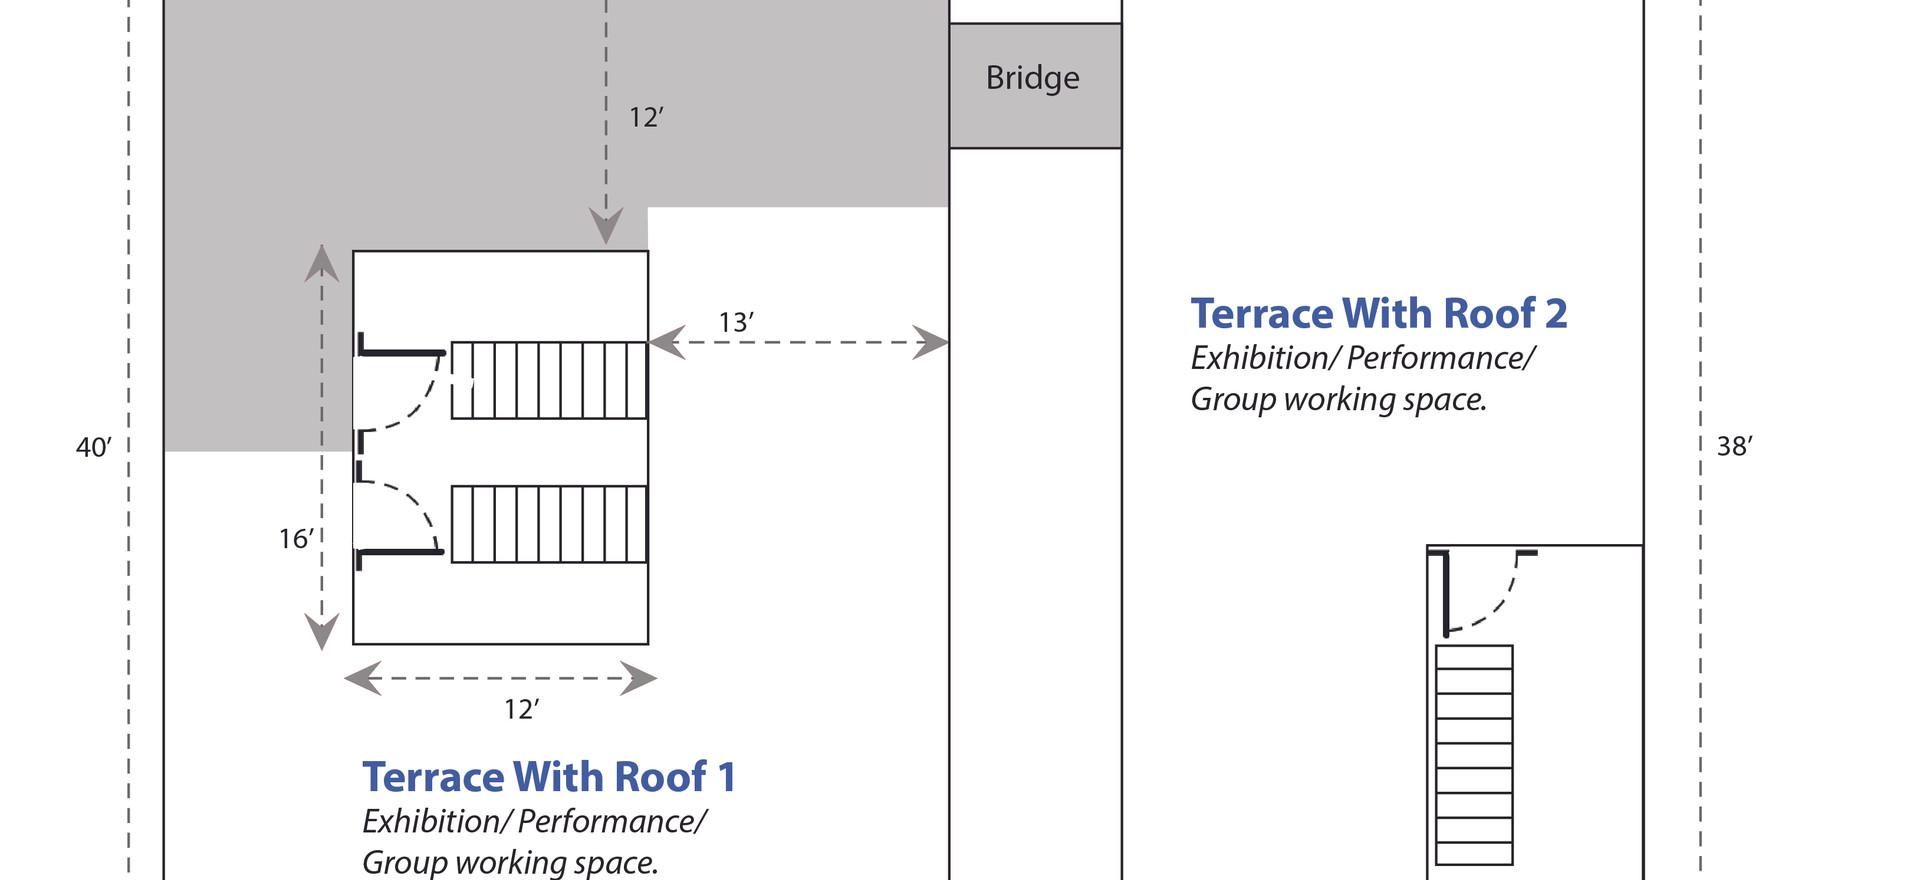 Terrace 1 & 2